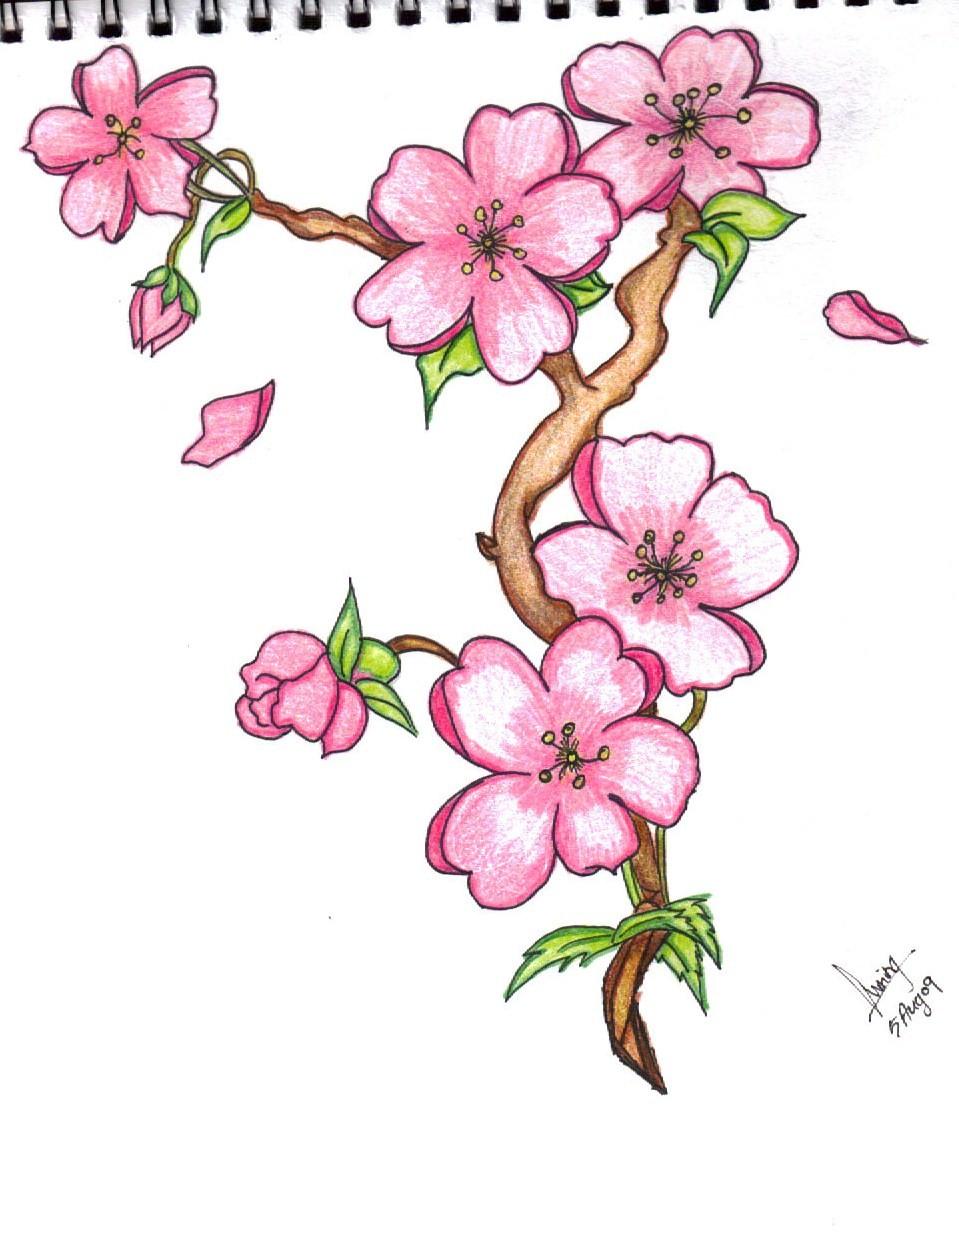 16 Flower Designs Drawings Images